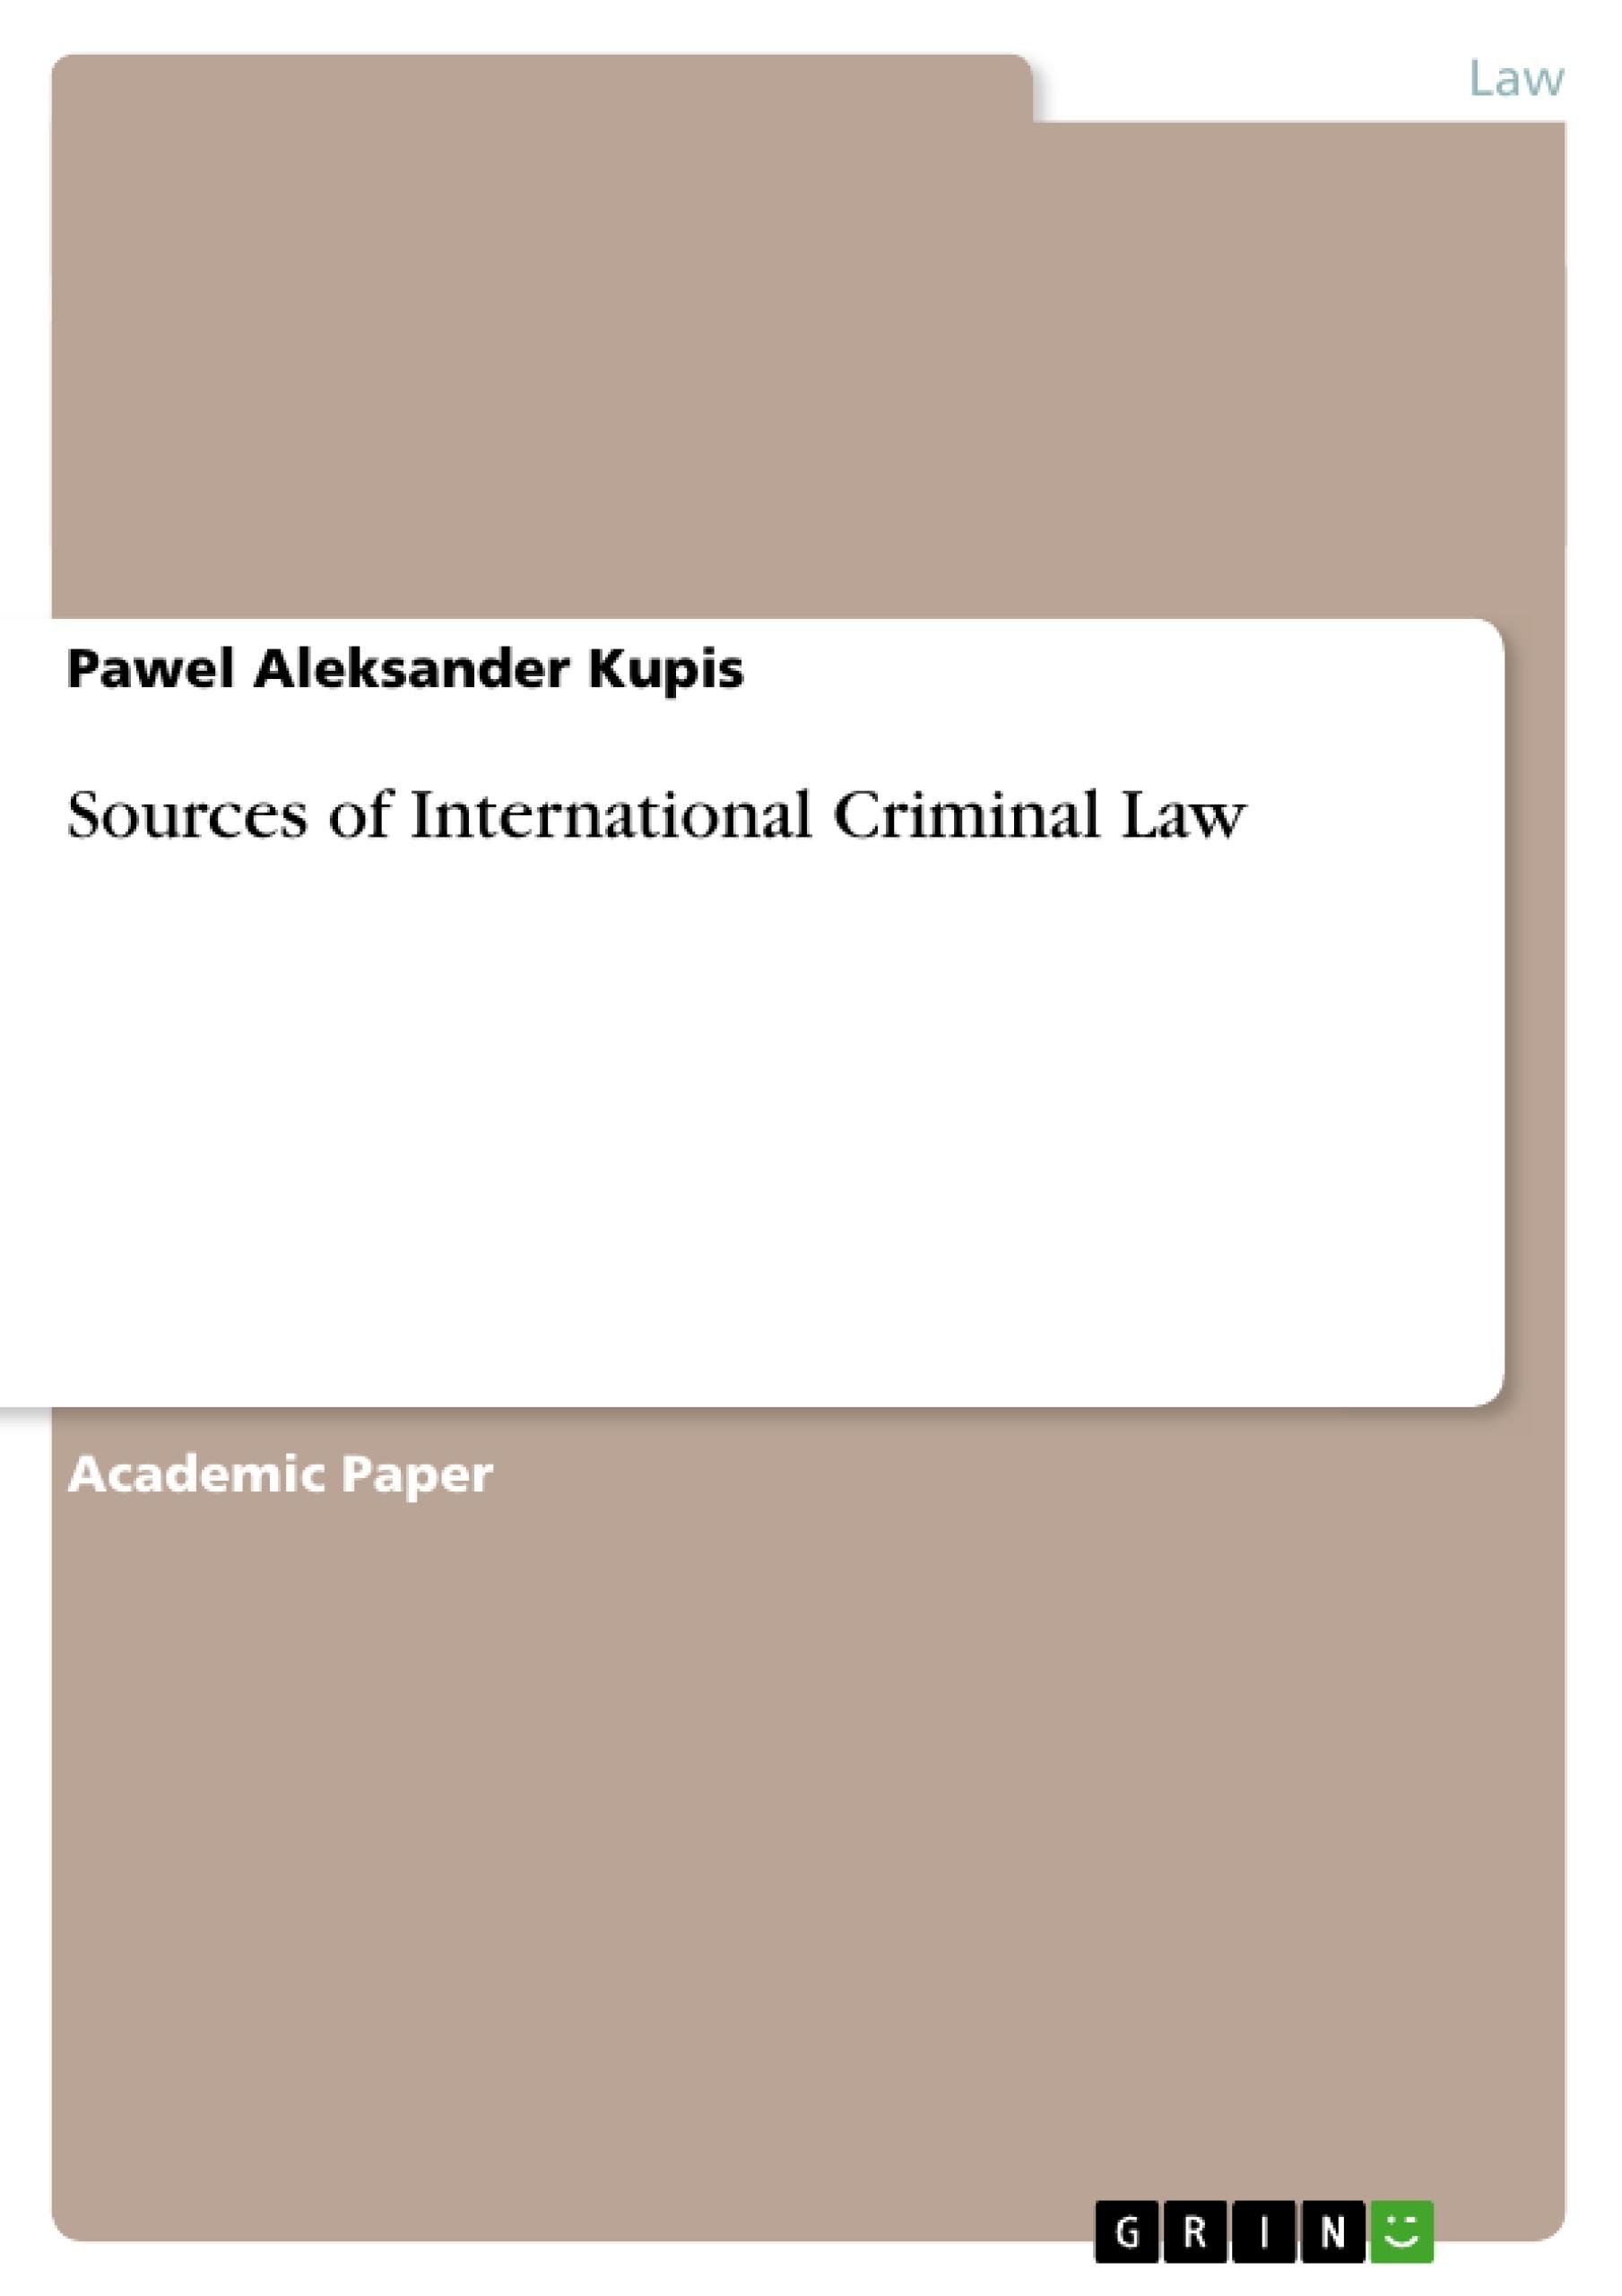 Title: Sources of International Criminal Law